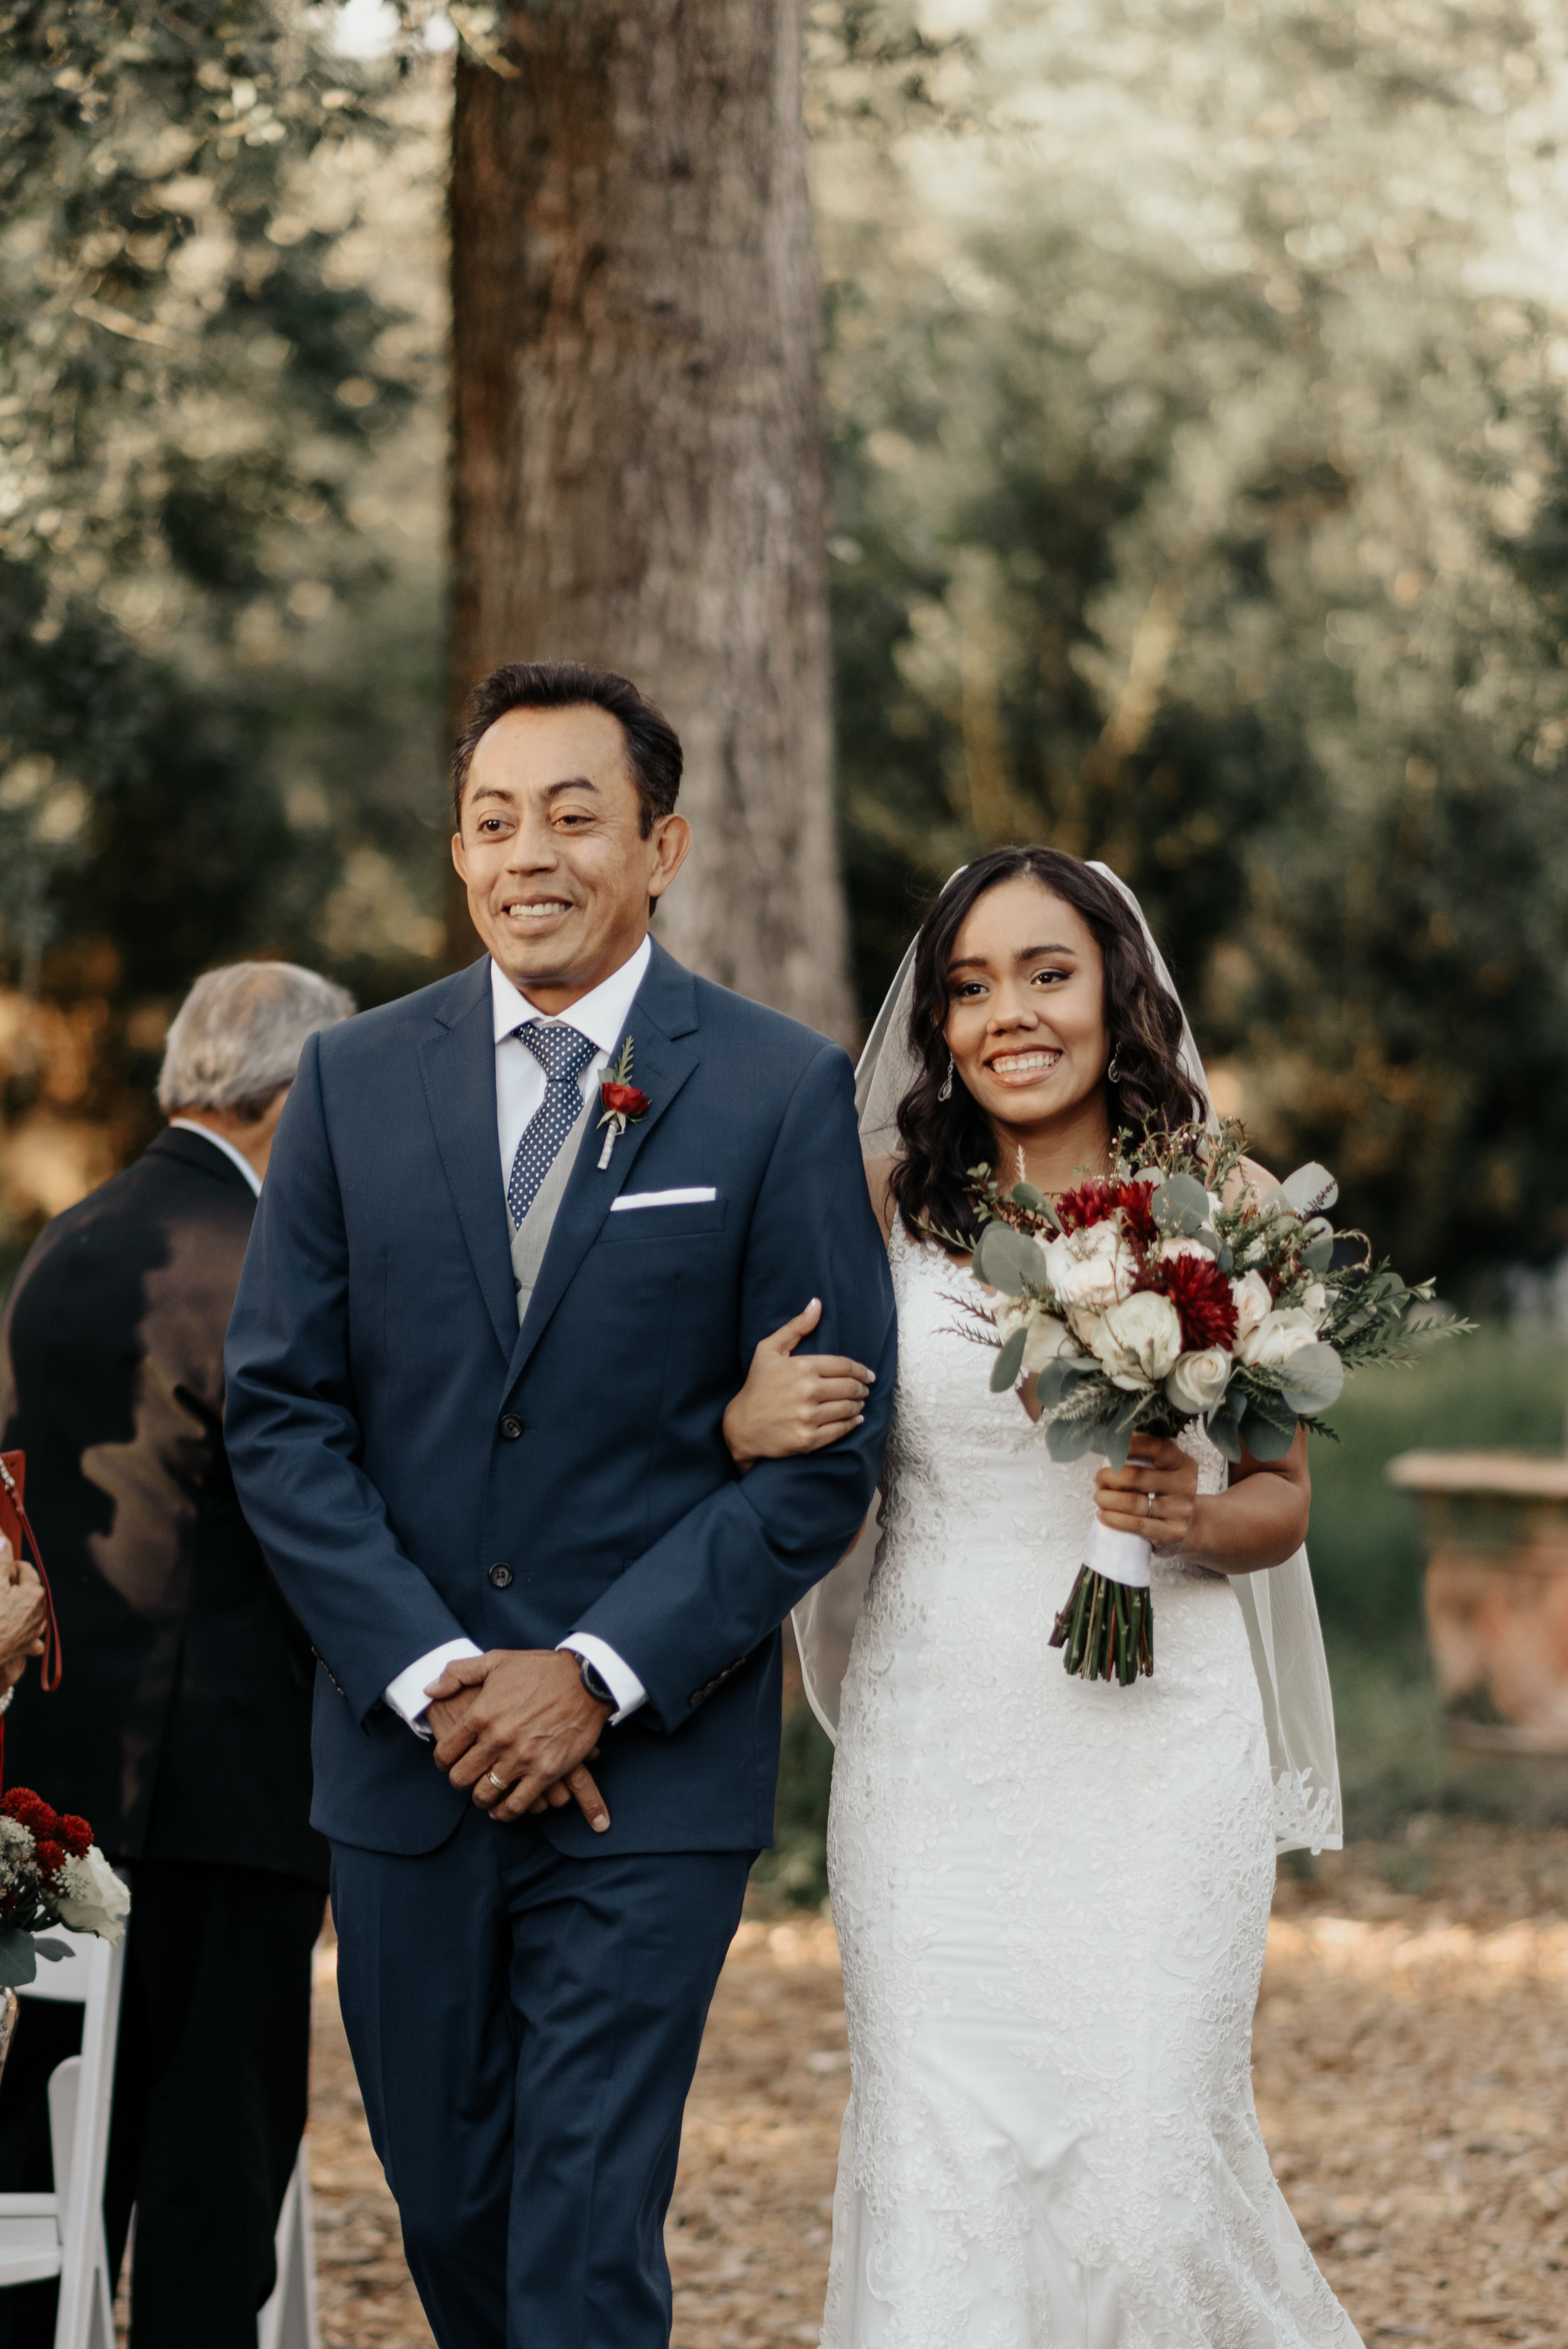 Kirstie-AJ-Wedding-9911.jpg